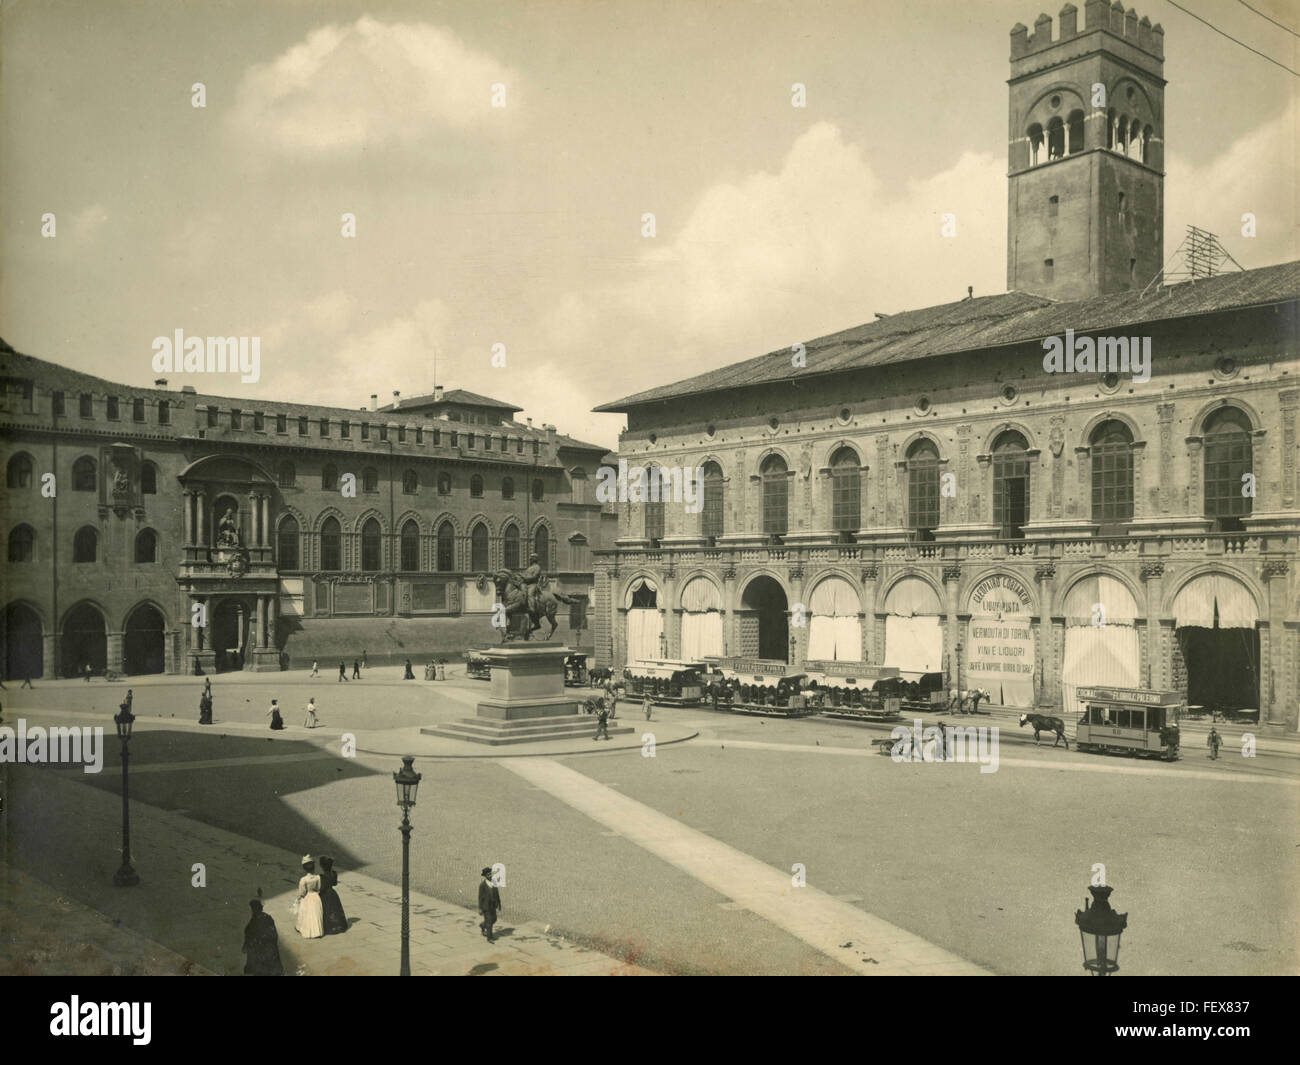 Piazza Vittorio Emanuele, Bologna, Italy - Stock Image